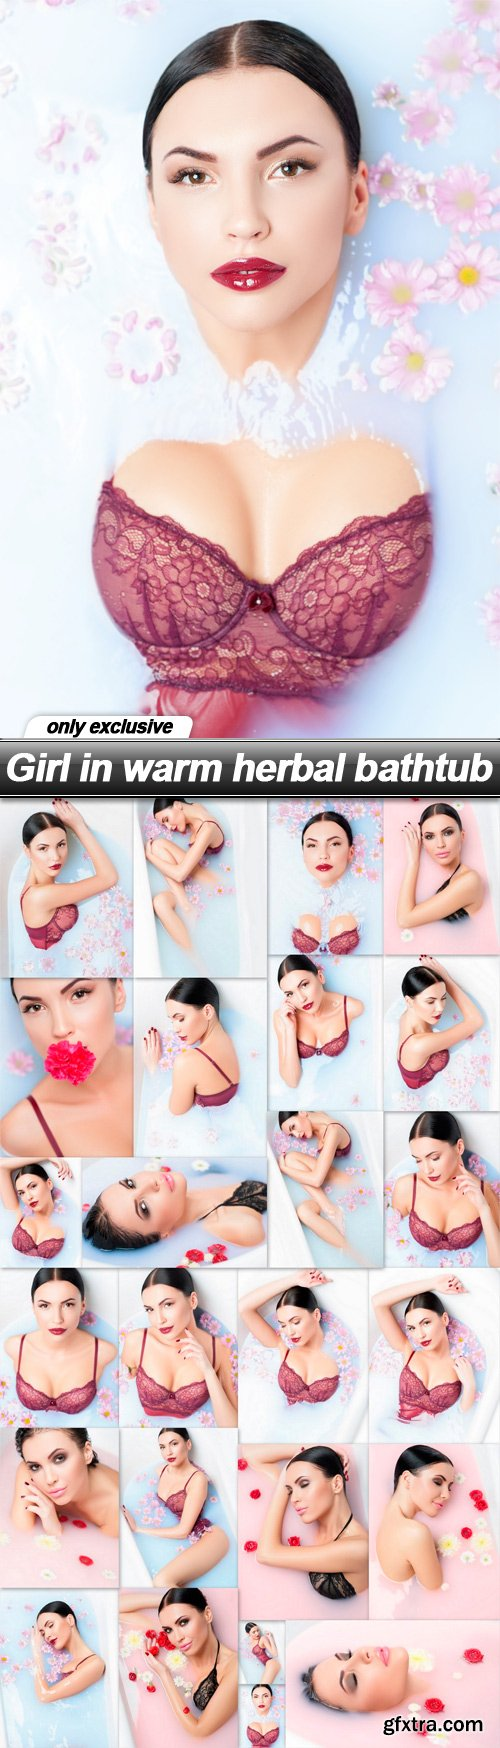 Girl in warm herbal bathtub - 25 UHQ JPEG